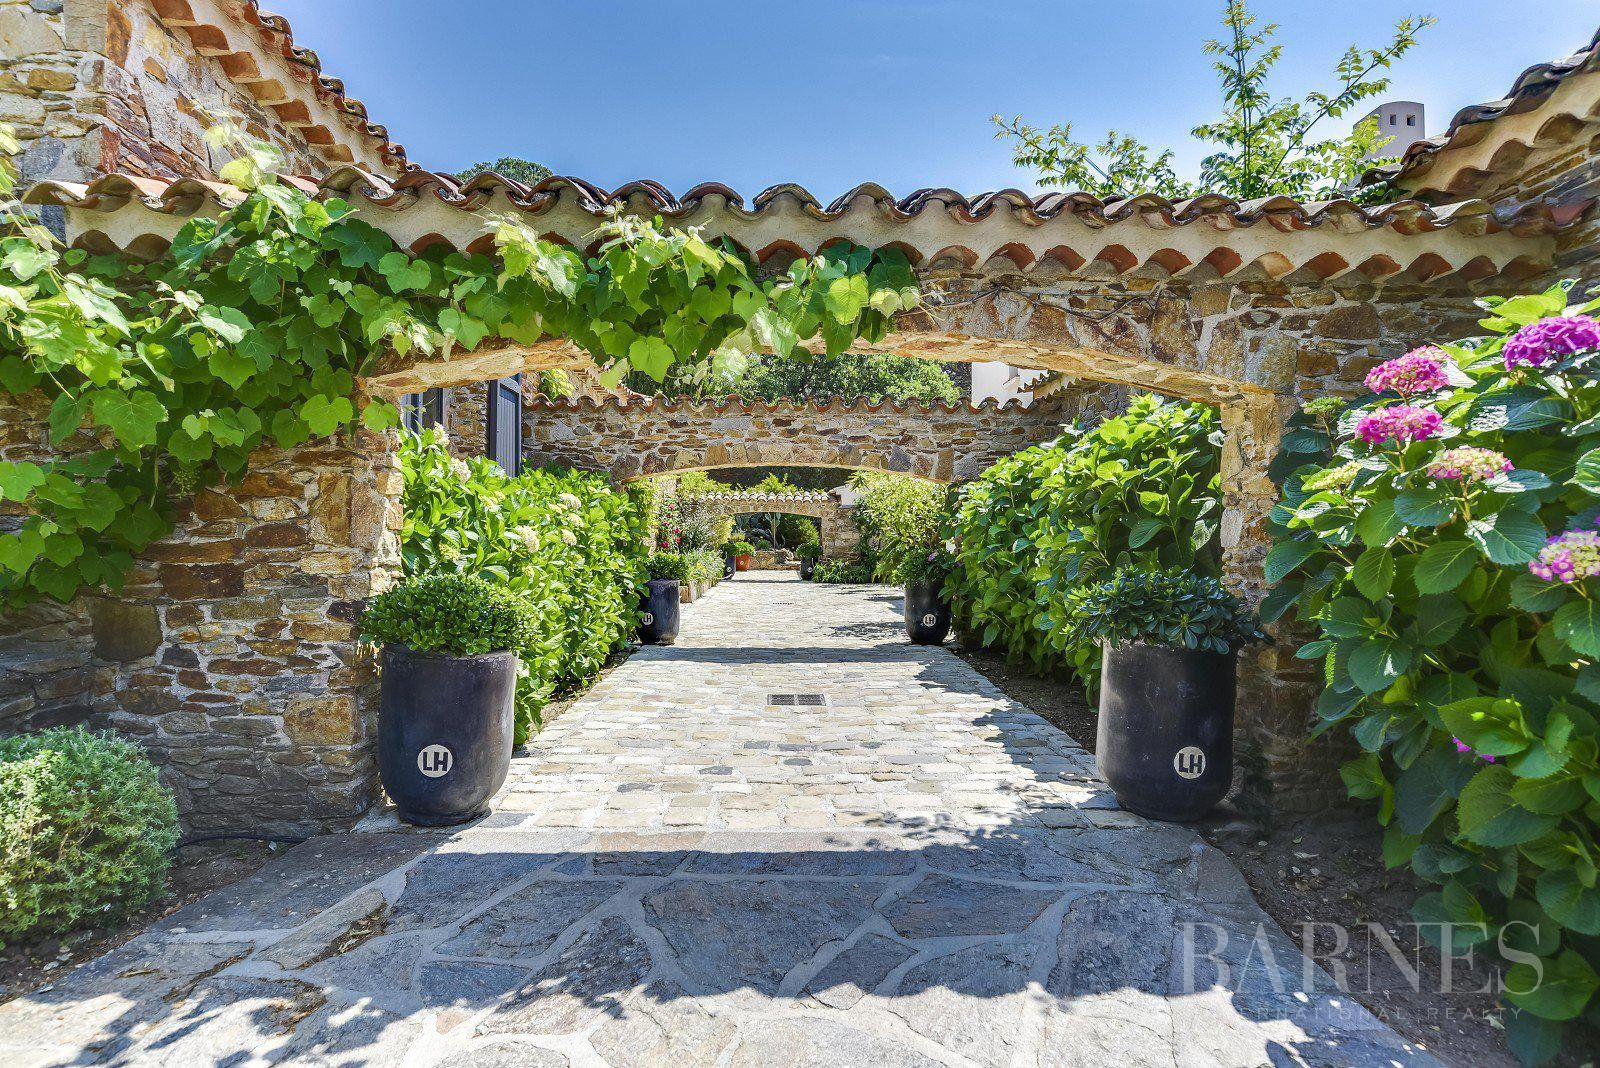 SAINT-TROPEZ - Between sea and vineyards